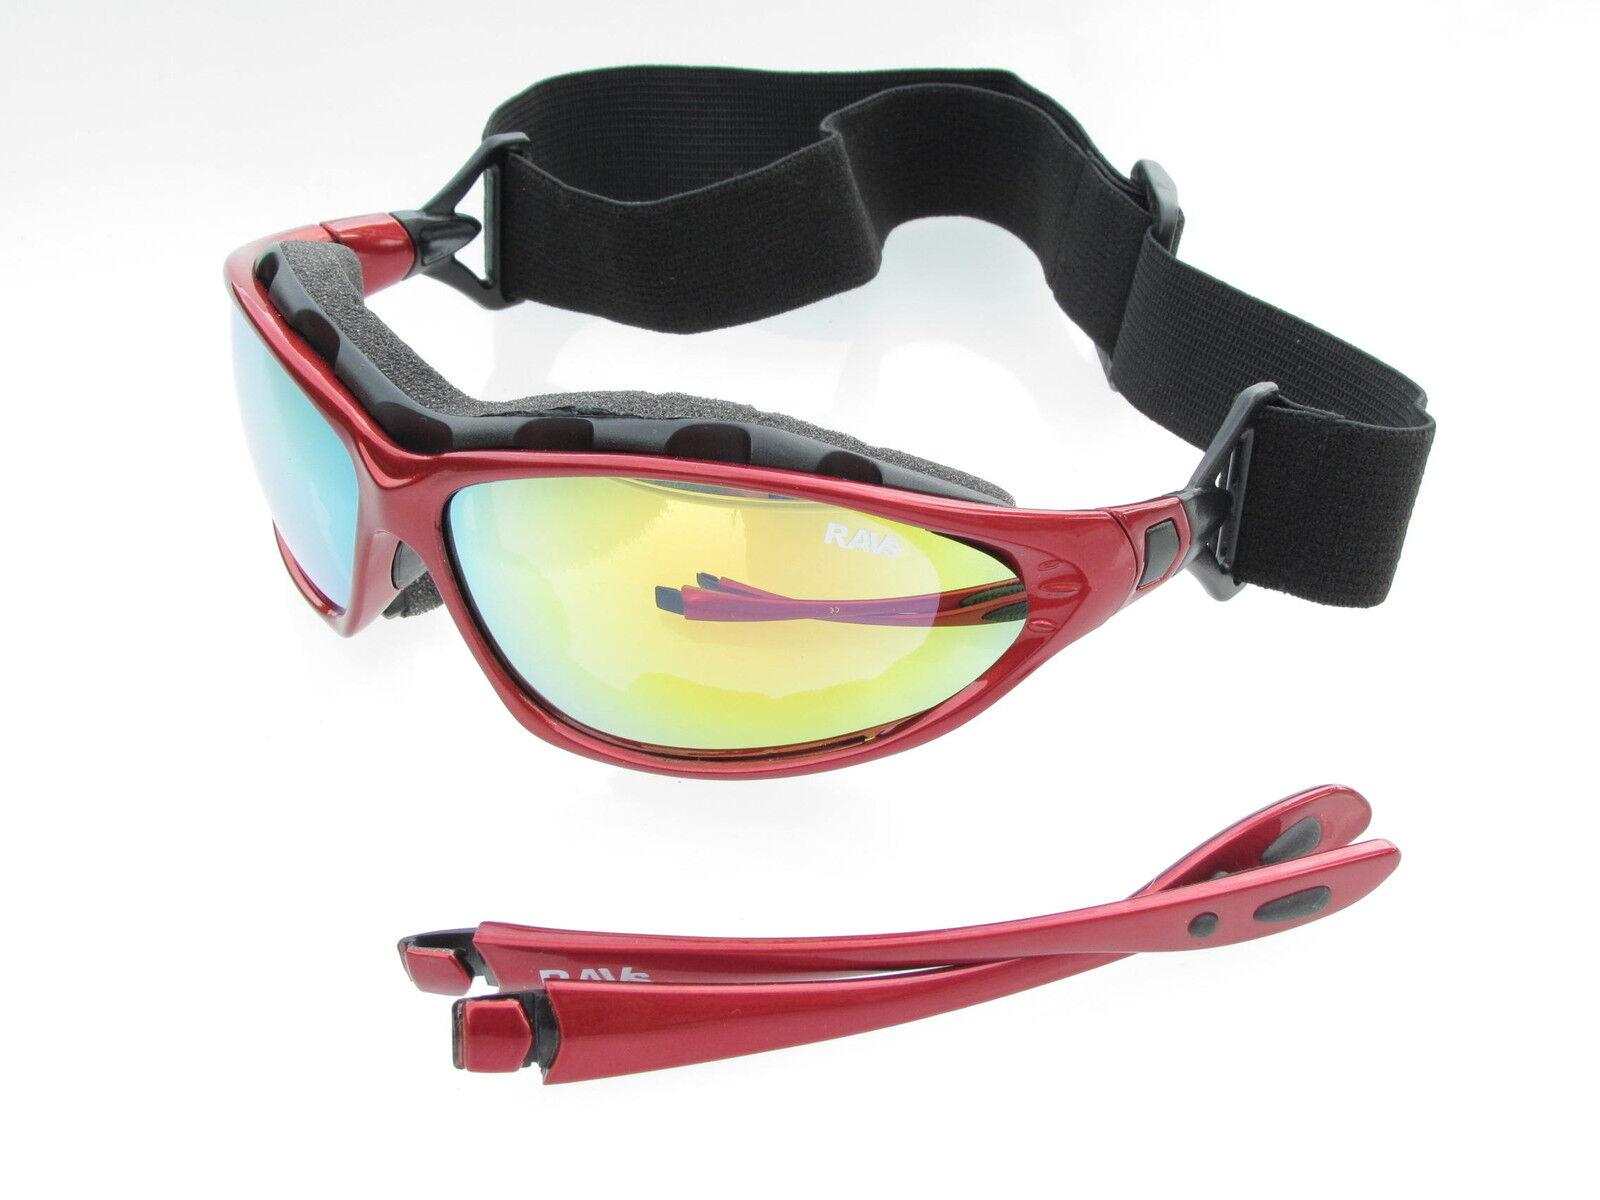 8e7ced7aeaa707 ... Lunettes de sport - - sport fun - radbrille- Kite - Surf - ravs 19a7f2